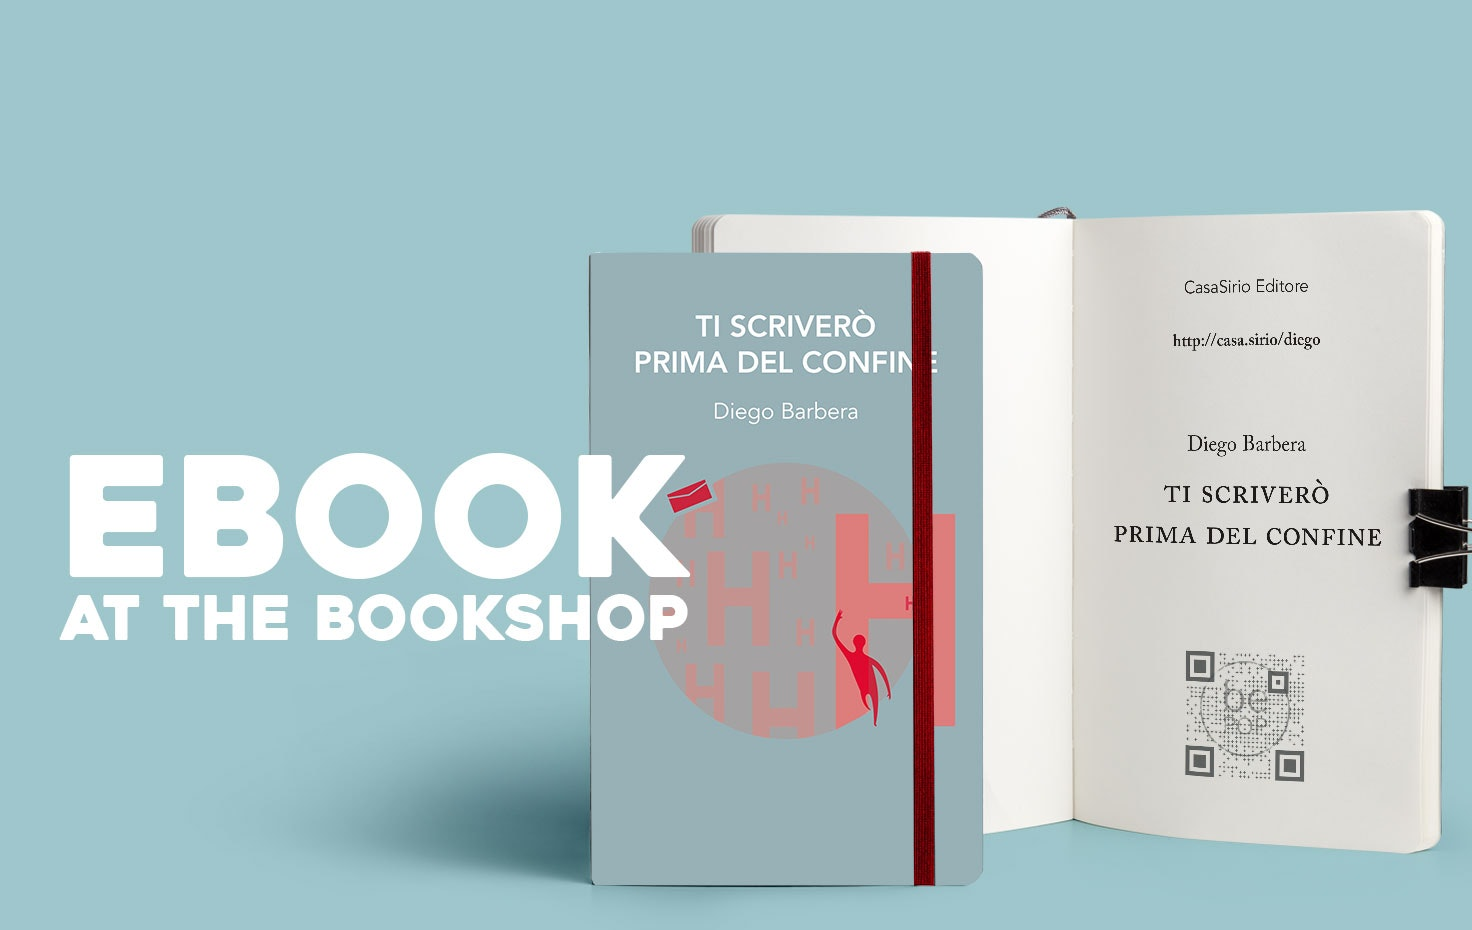 eBook @ the bookshop